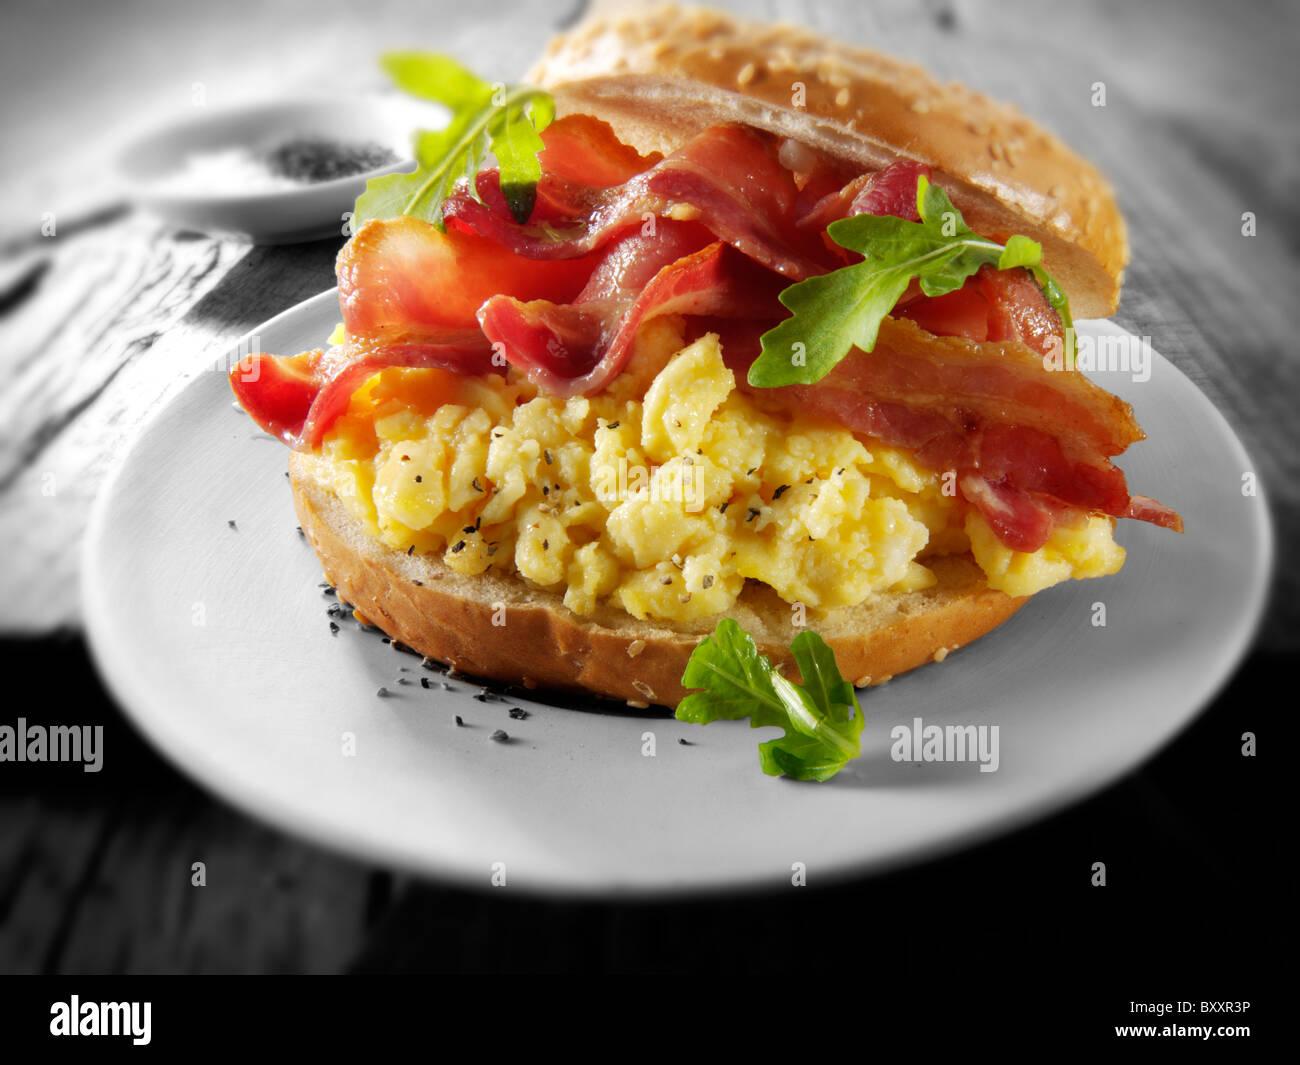 Crispy backon and scrambled eggs on a bagel - Stock Image